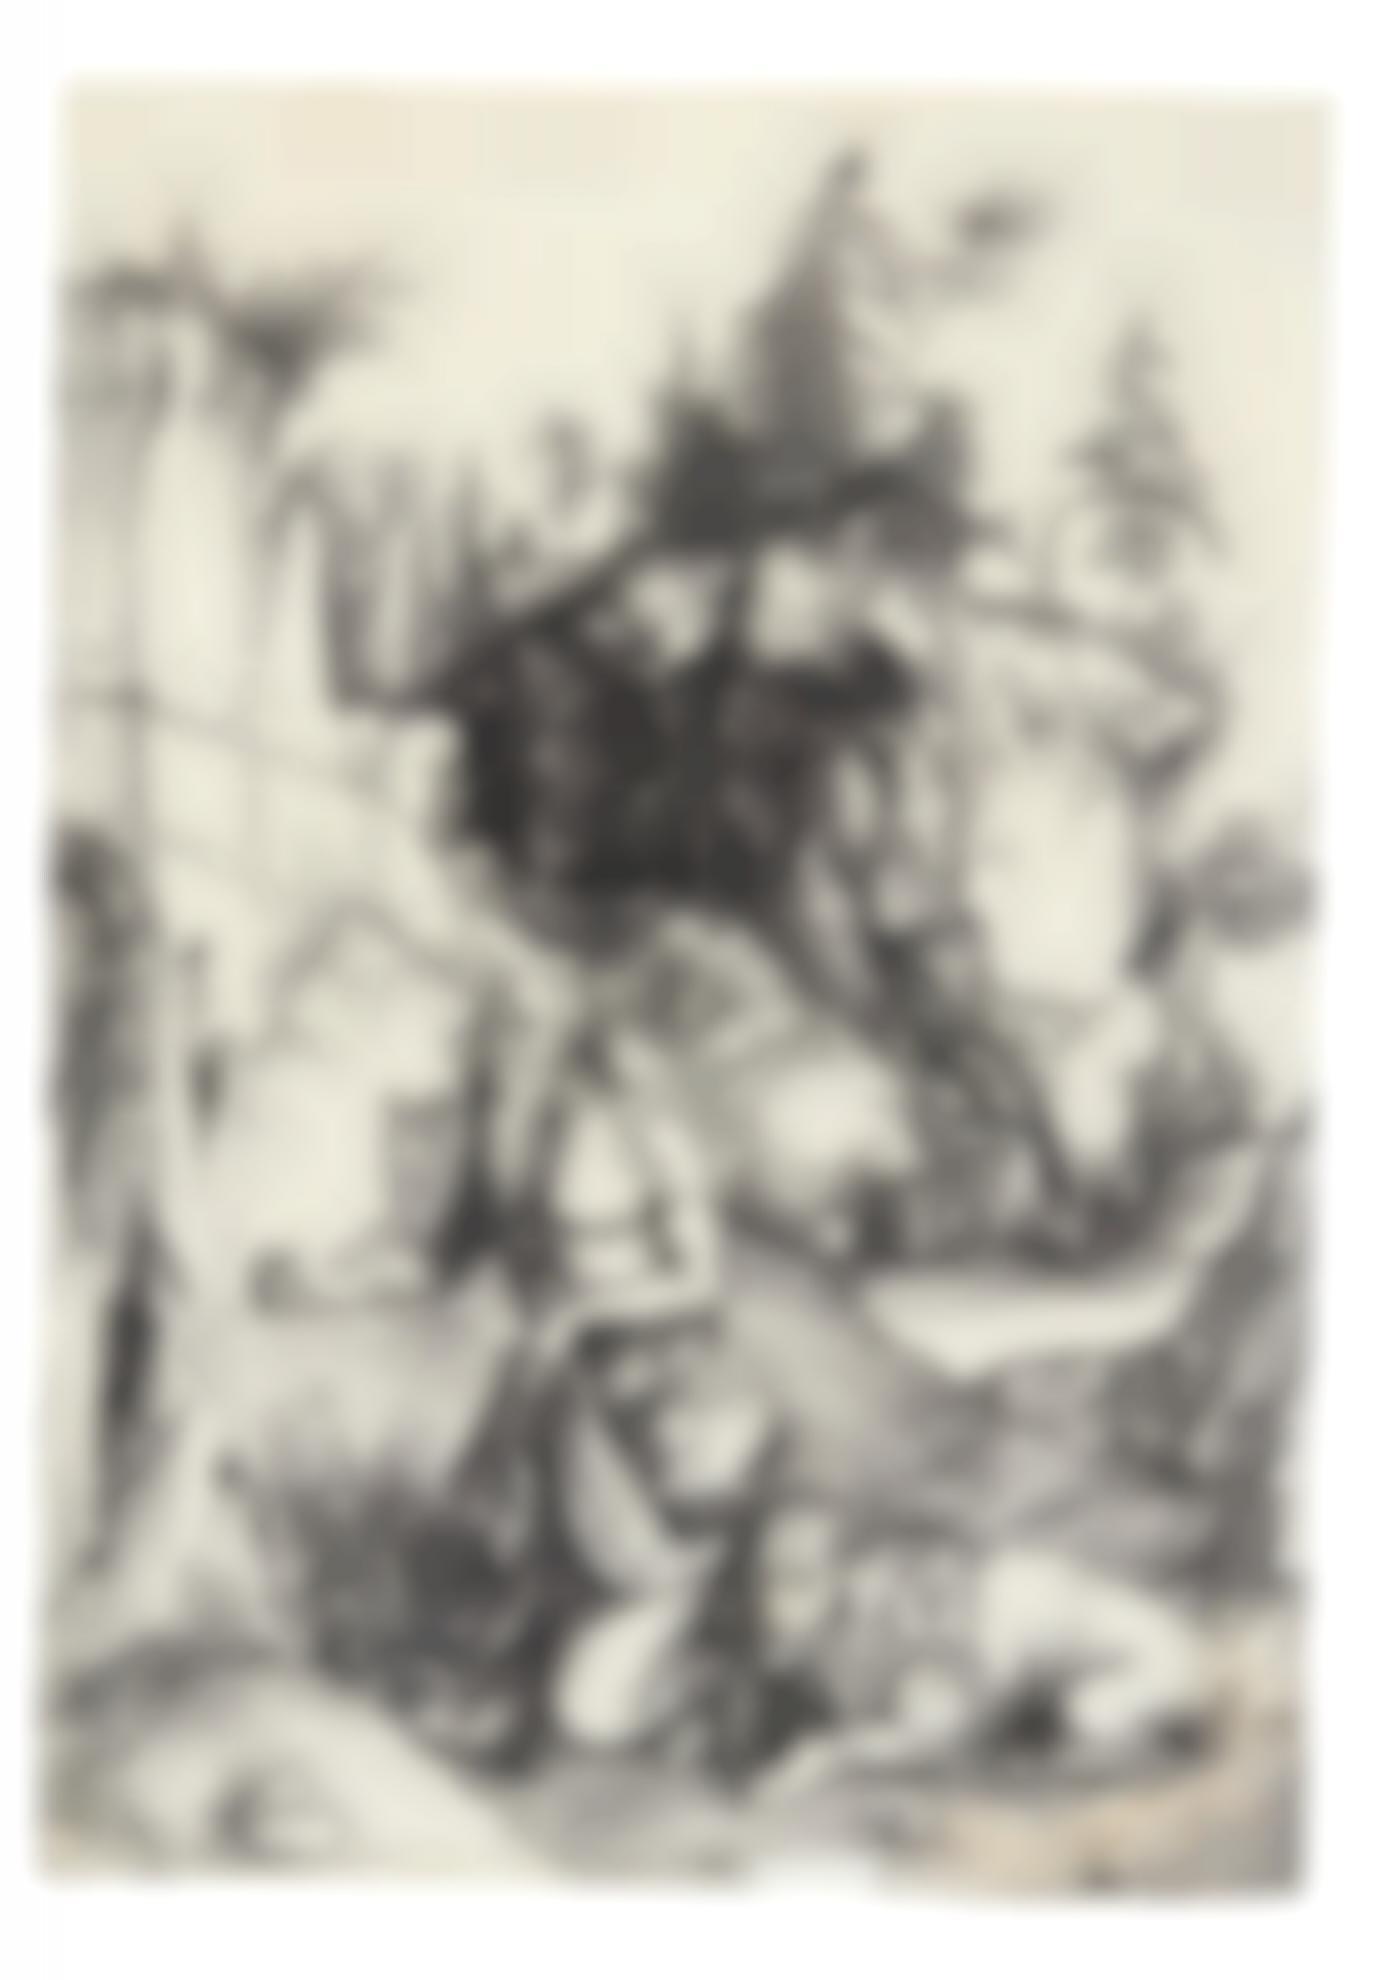 Albrecht Durer-St. Jerome Penitent In The Wilderness (B. 61; M., Holl. 57)-1496